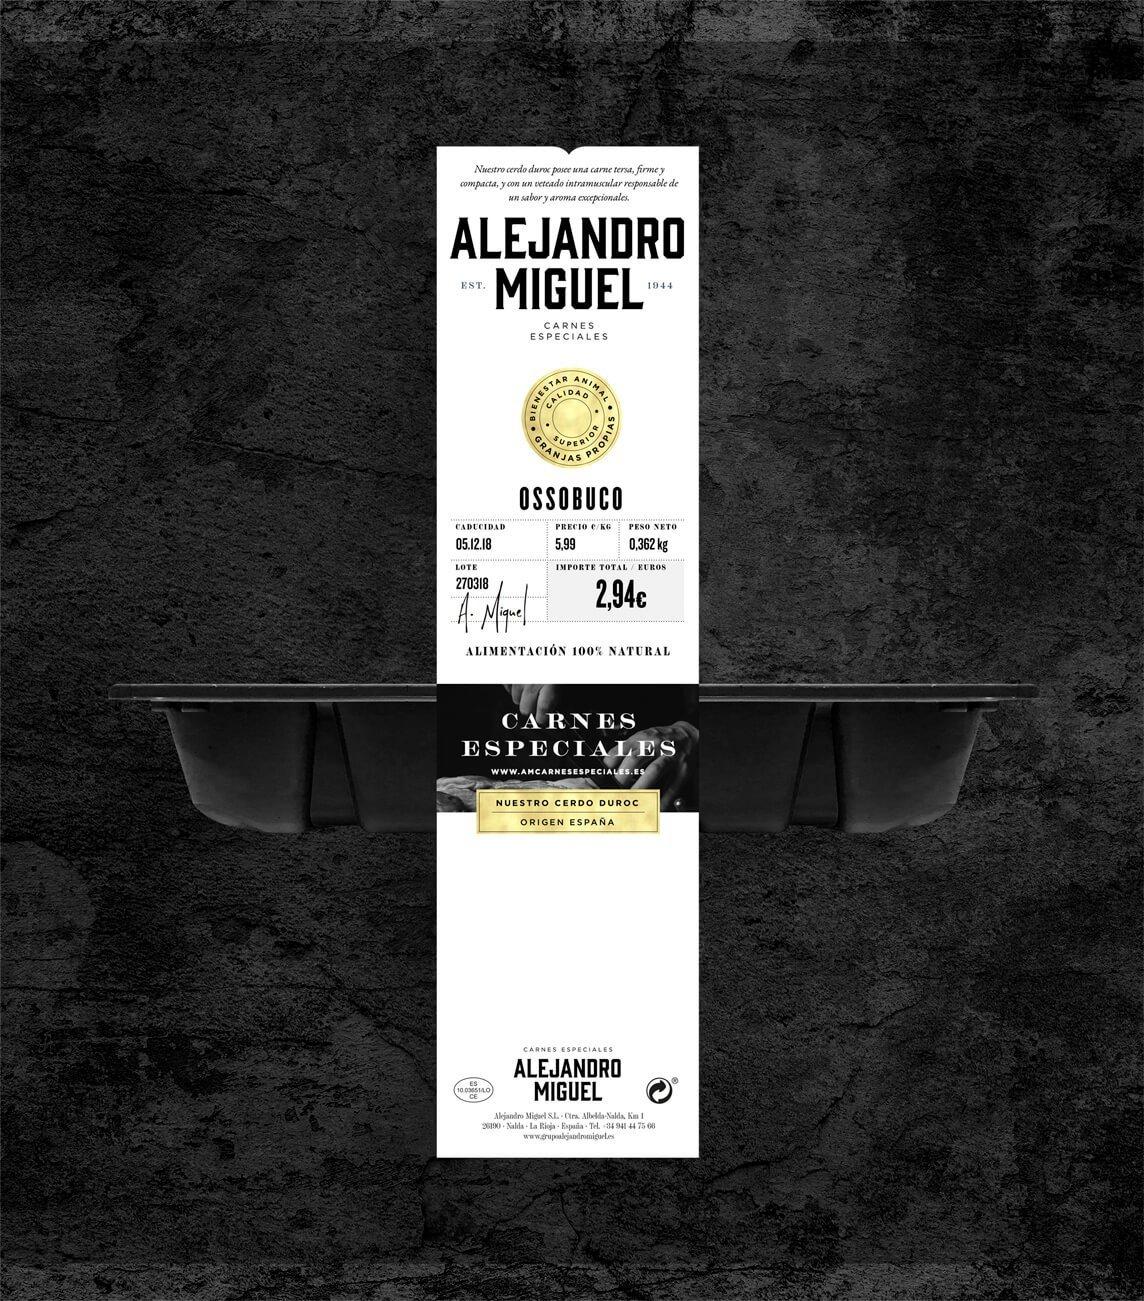 packaging-bandeja-etiqueta-carne-cerdo-duroc-alejandro-miguel